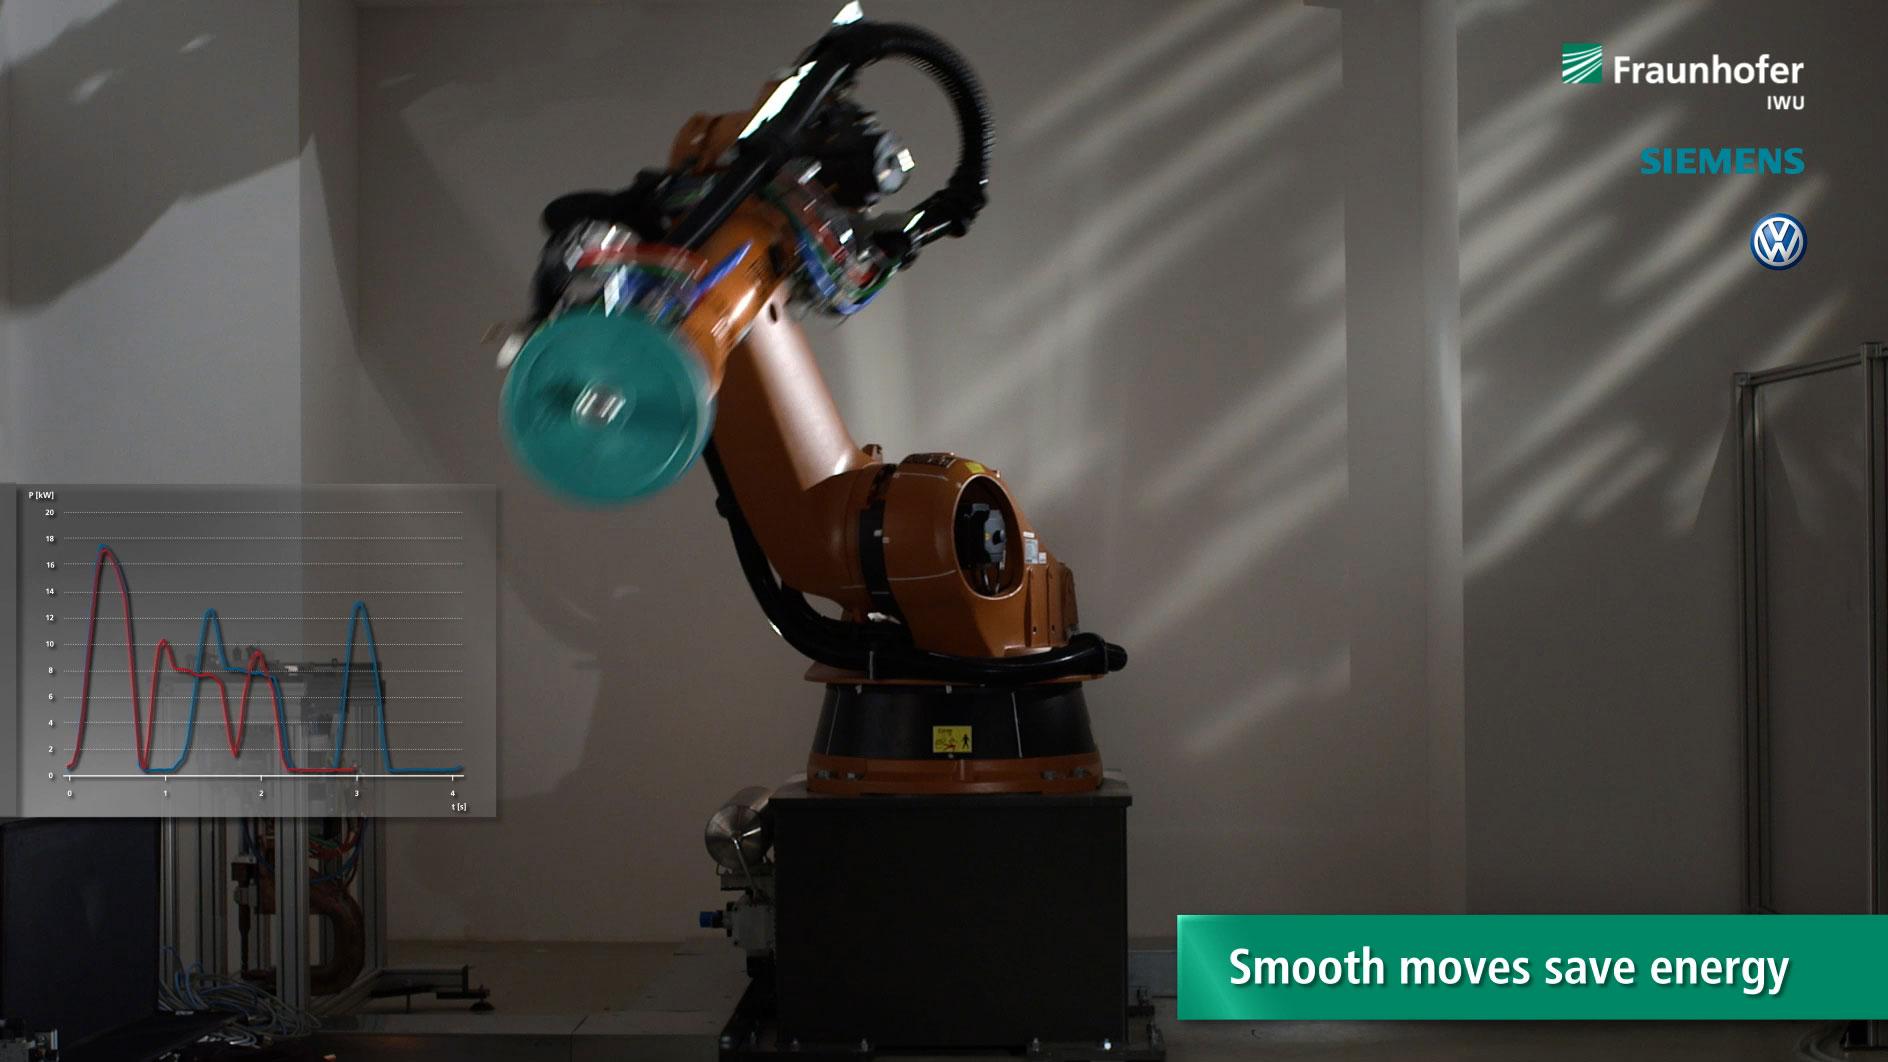 20130419_Siemens_Roboter_003.jpg